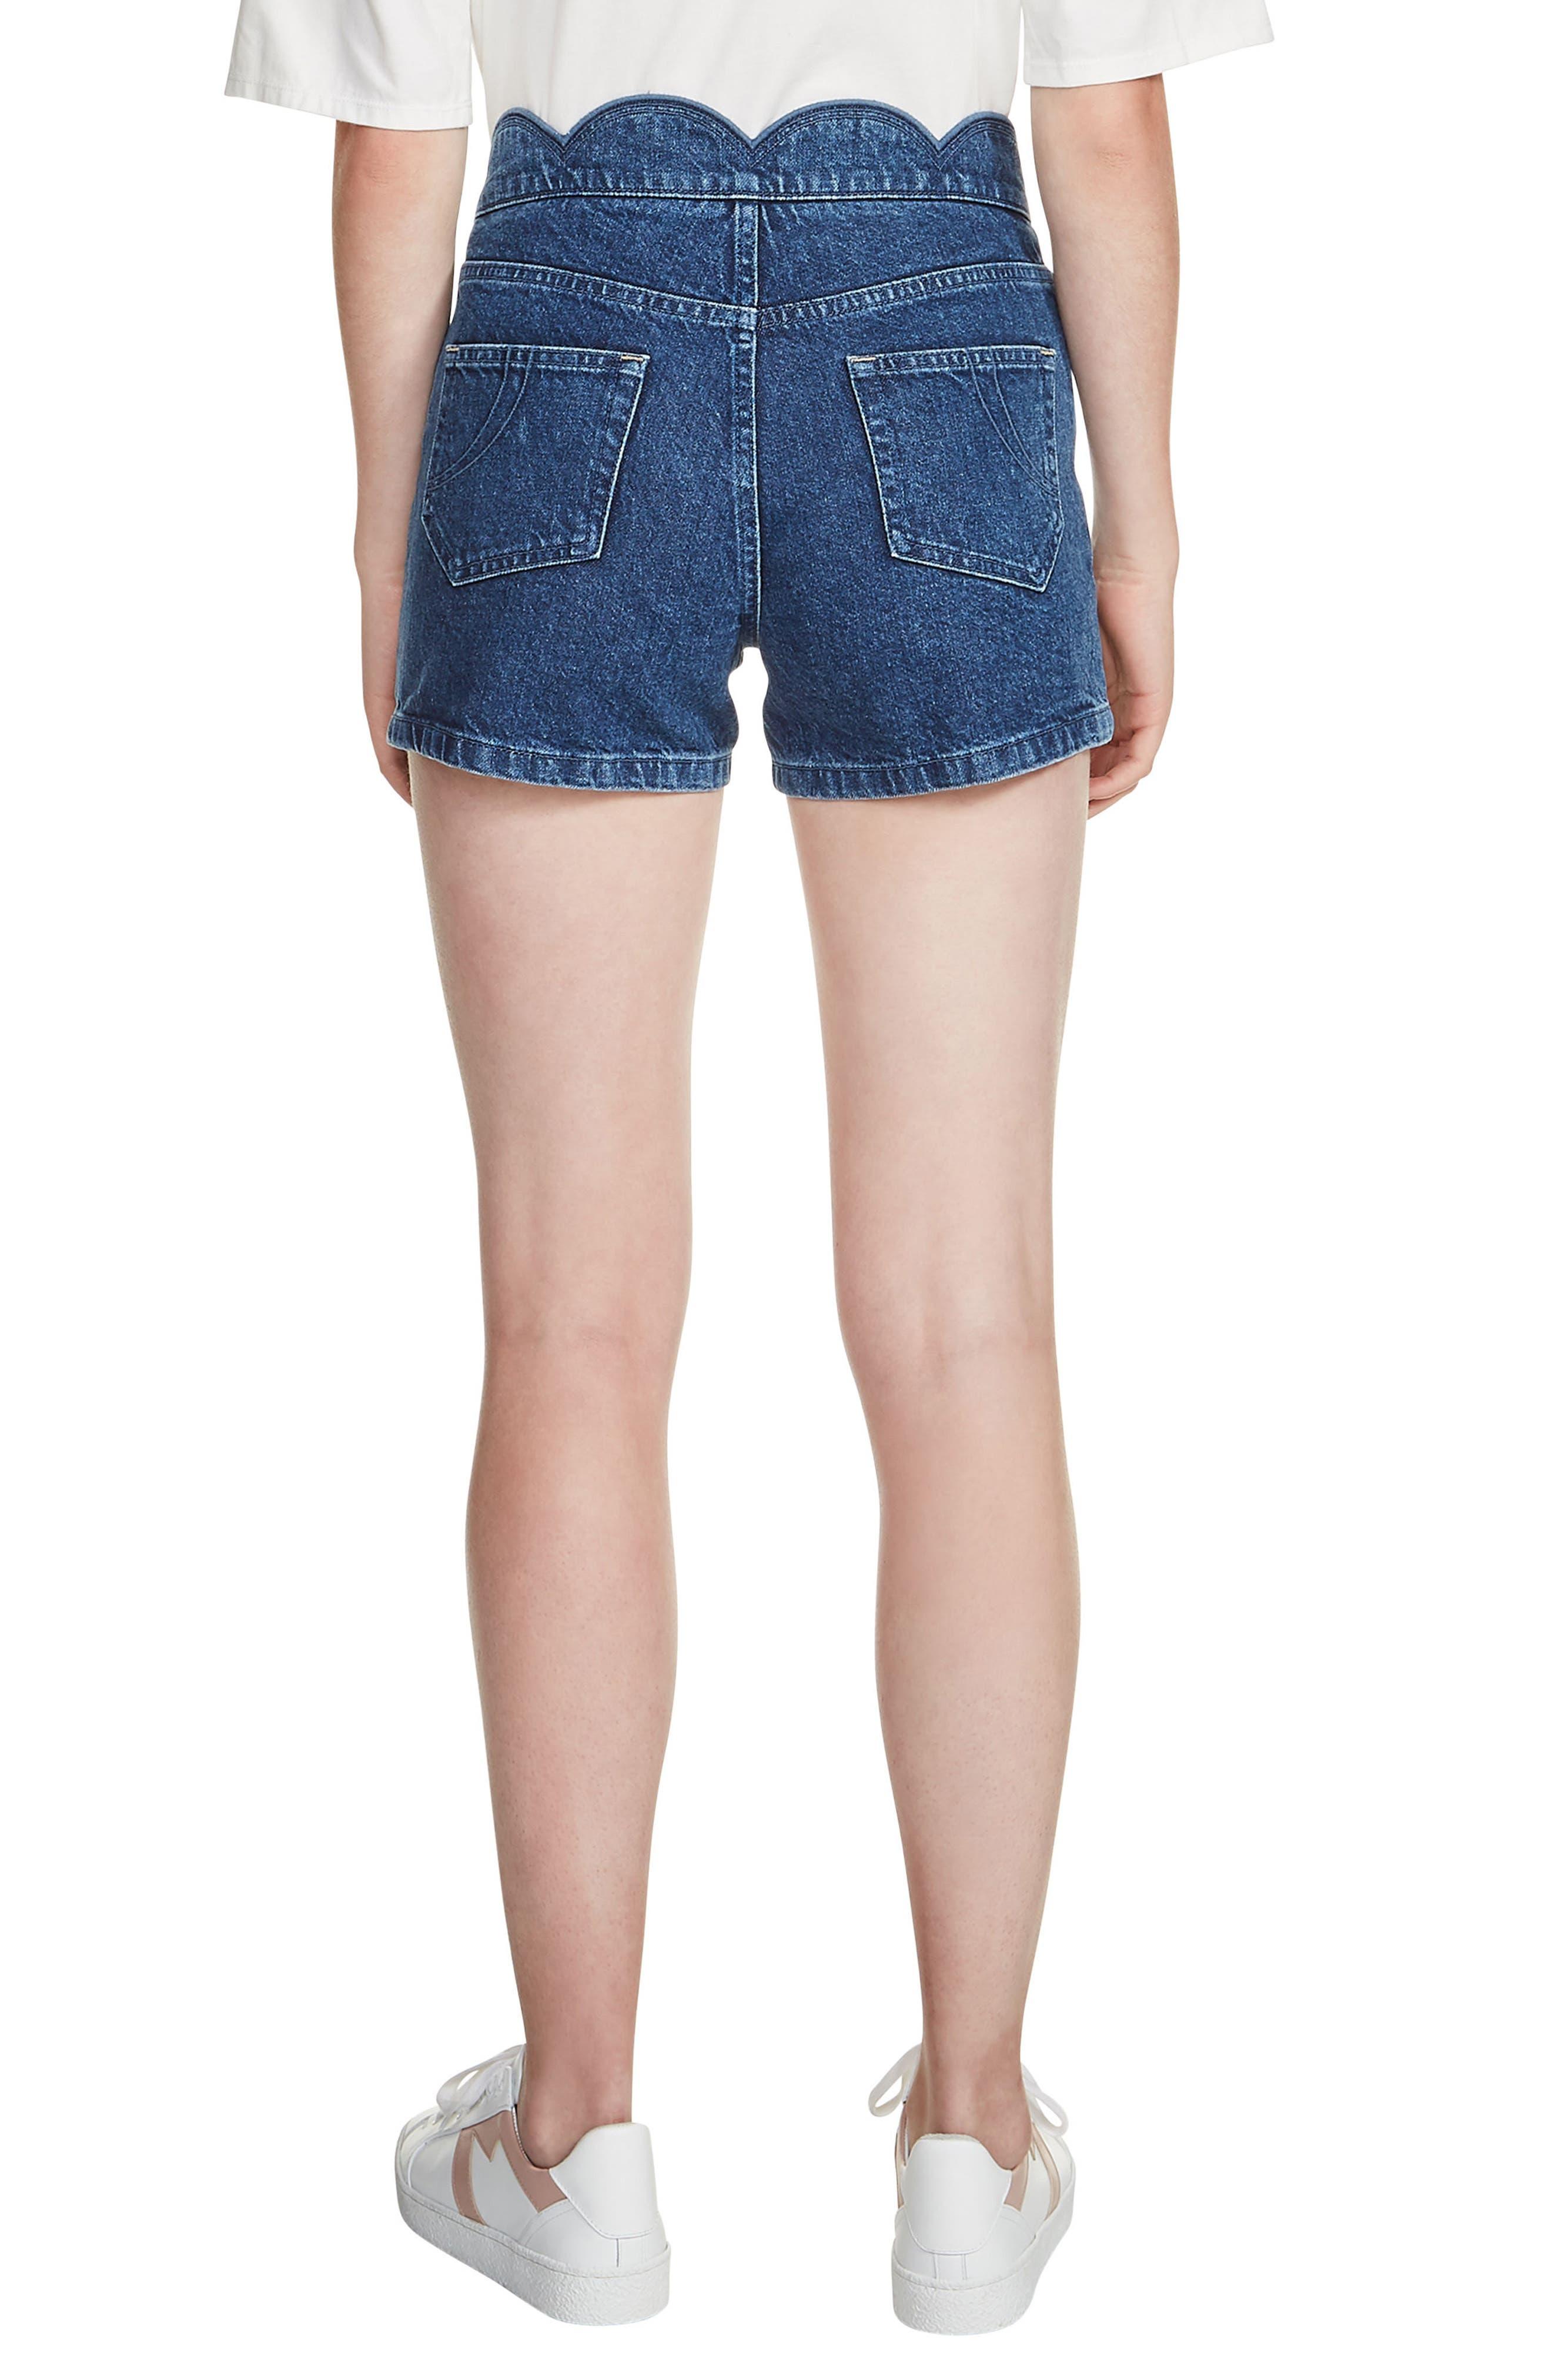 Shafti Scallop Waist Denim Shorts,                             Alternate thumbnail 2, color,                             Denim